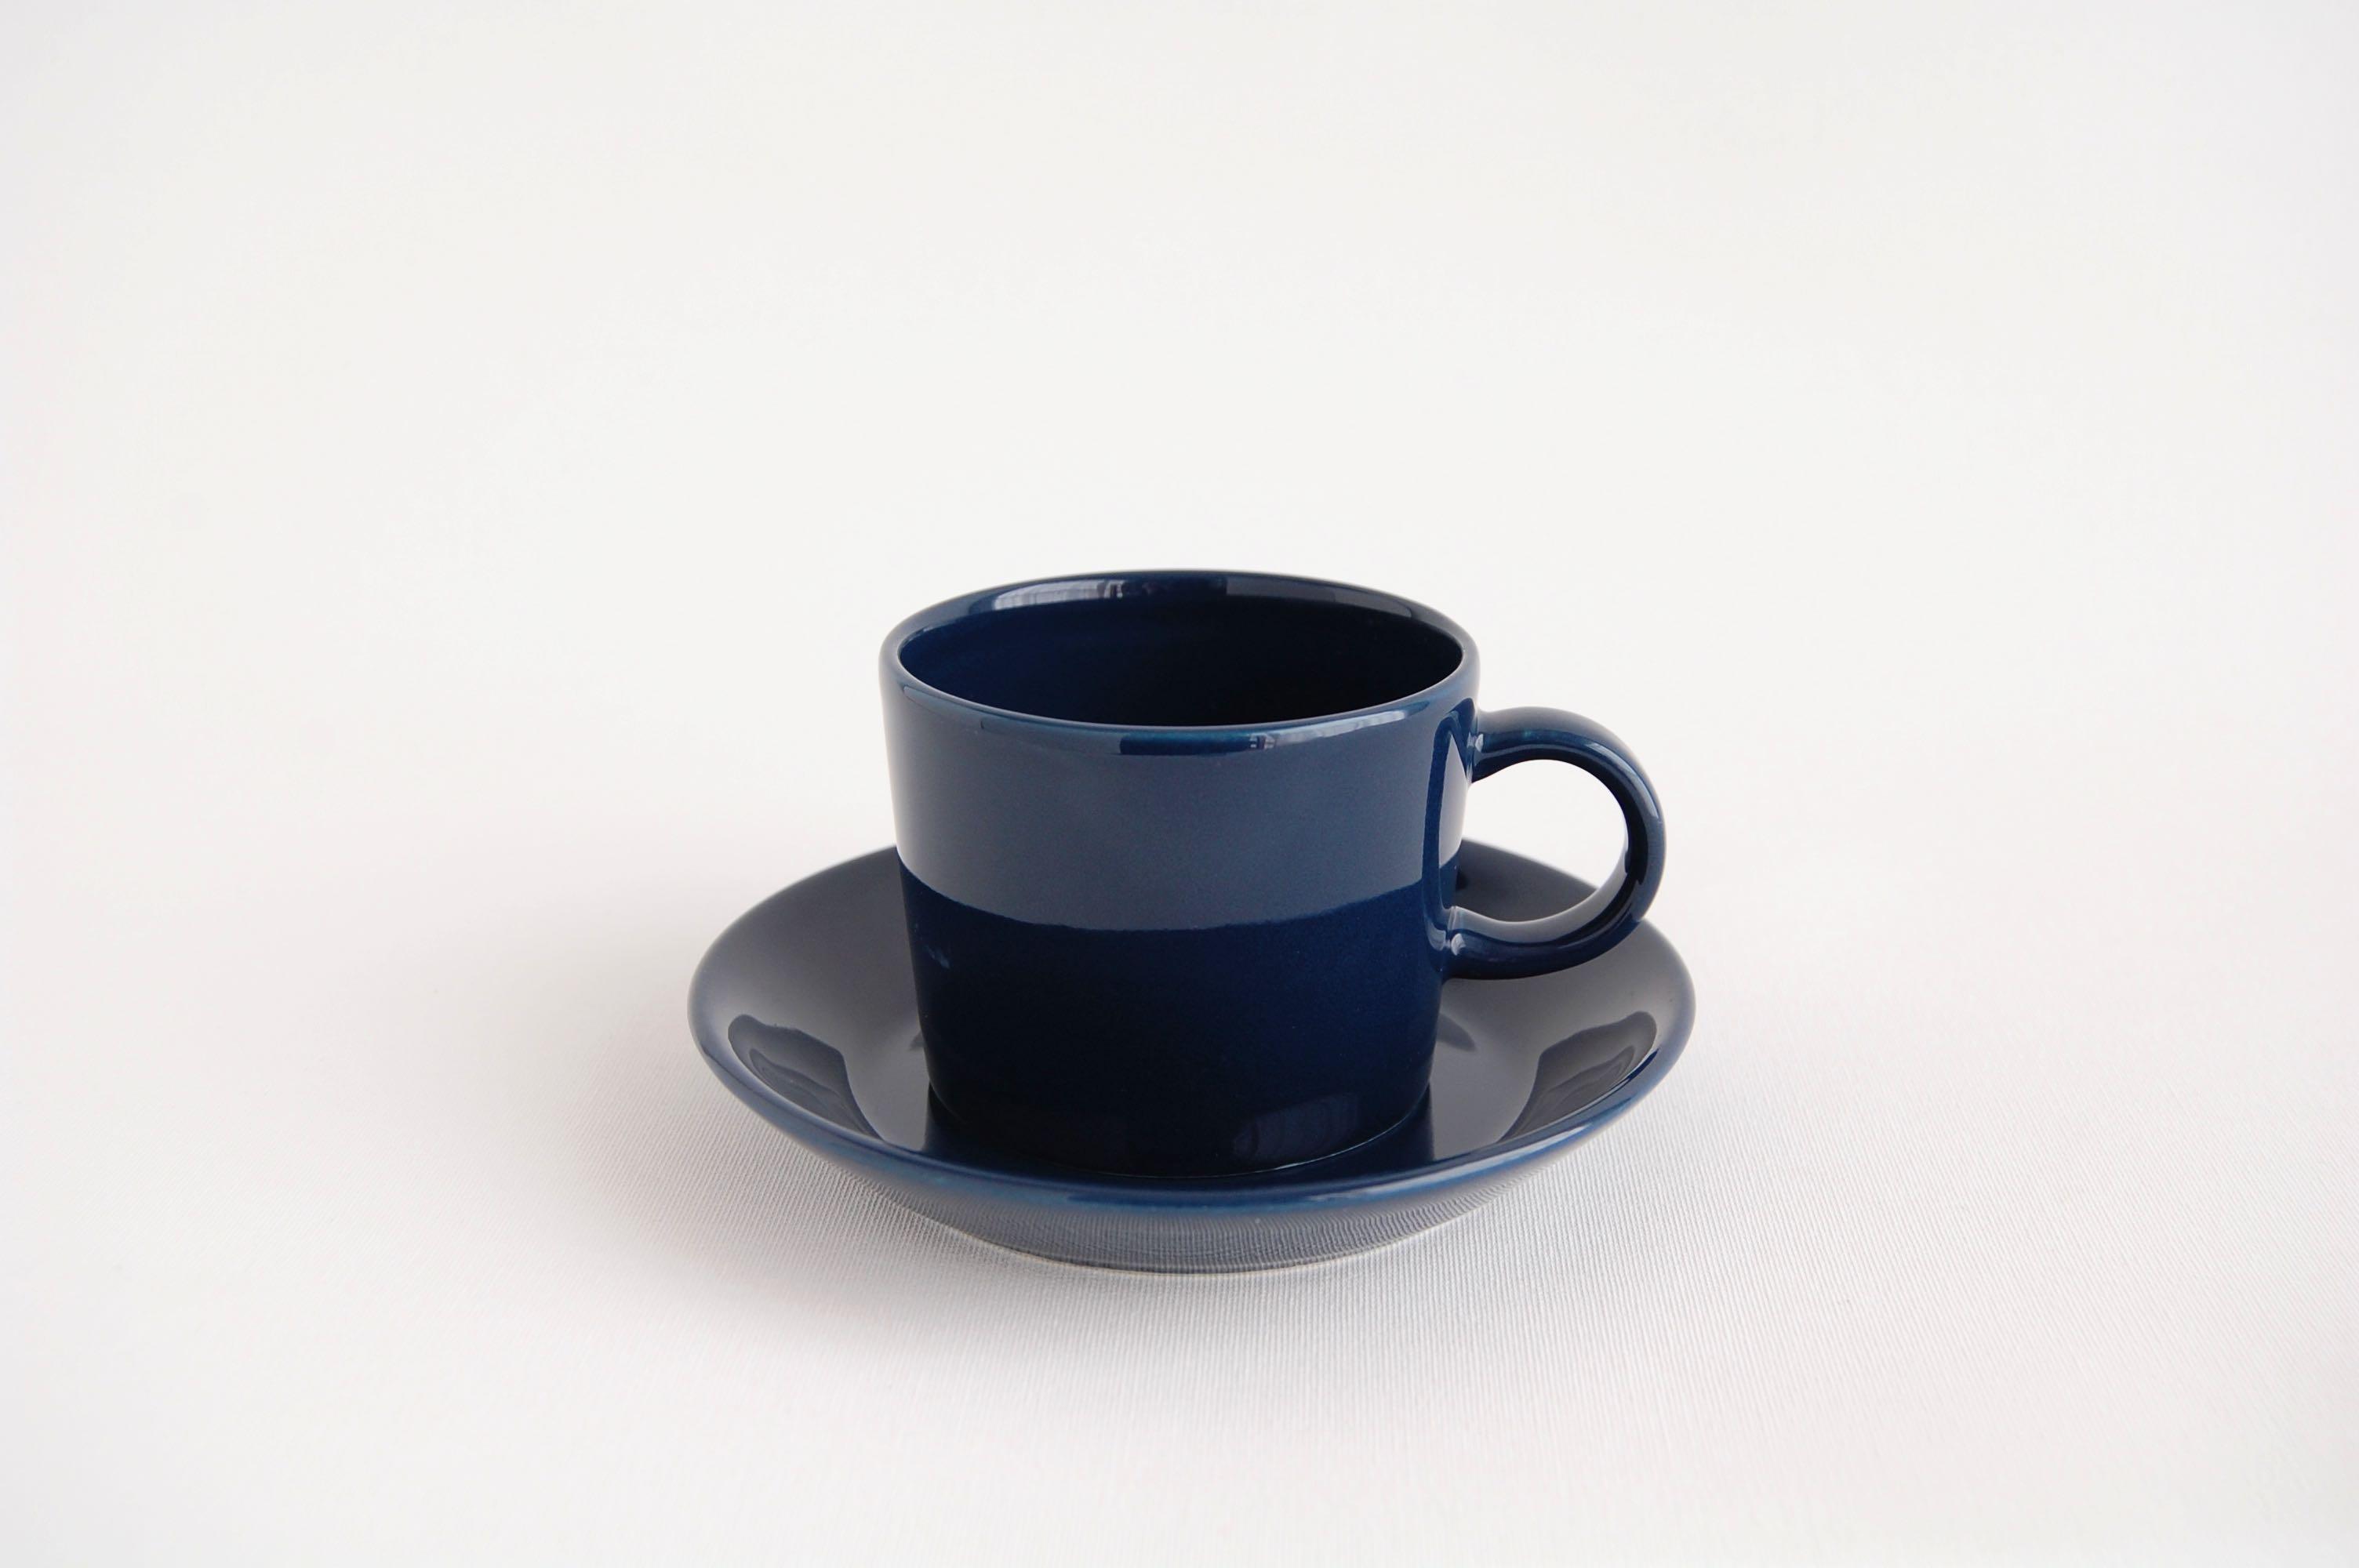 ARABIA/アラビア TEEMA/ティーマ コーヒーカップ&ソーサー ブルー001